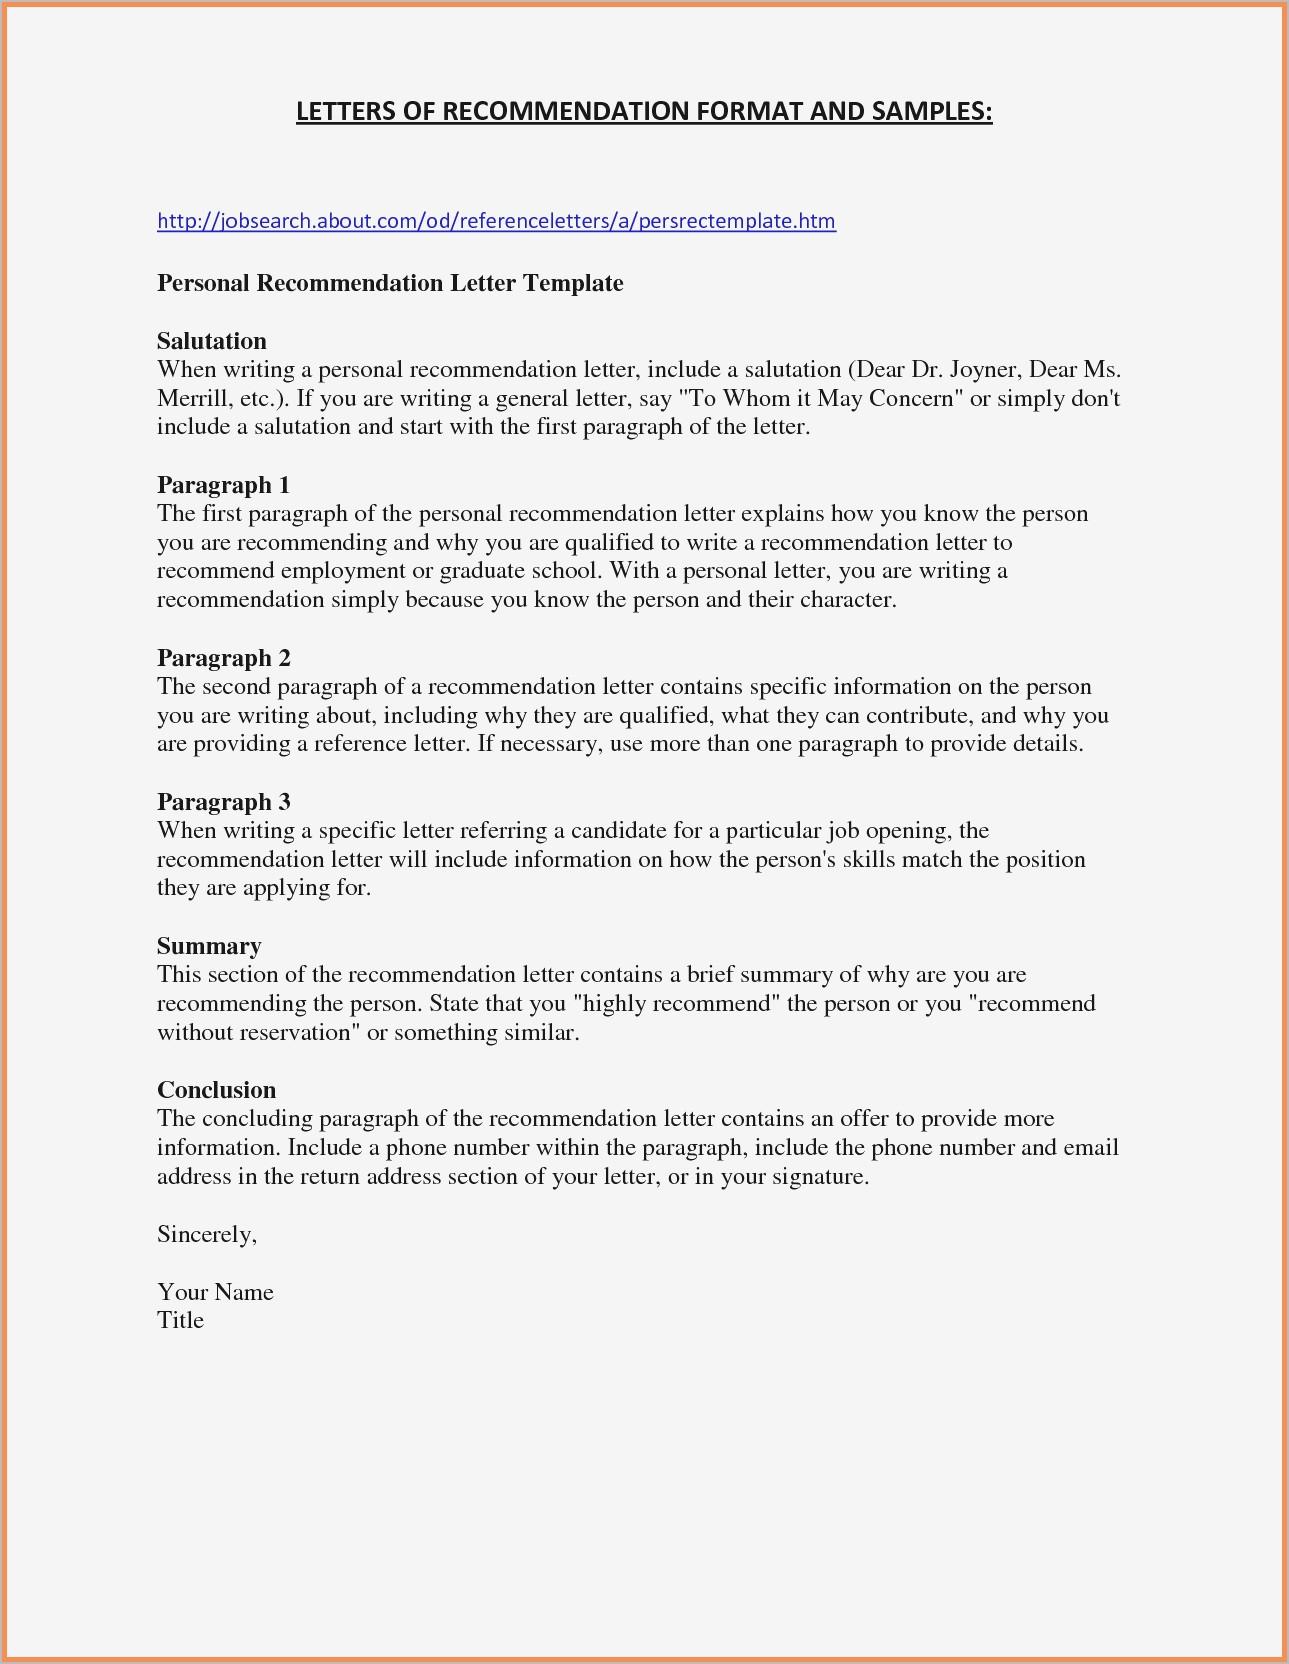 nursing school recommendation letter template letter of re mendation for a nurse friend eczalinf